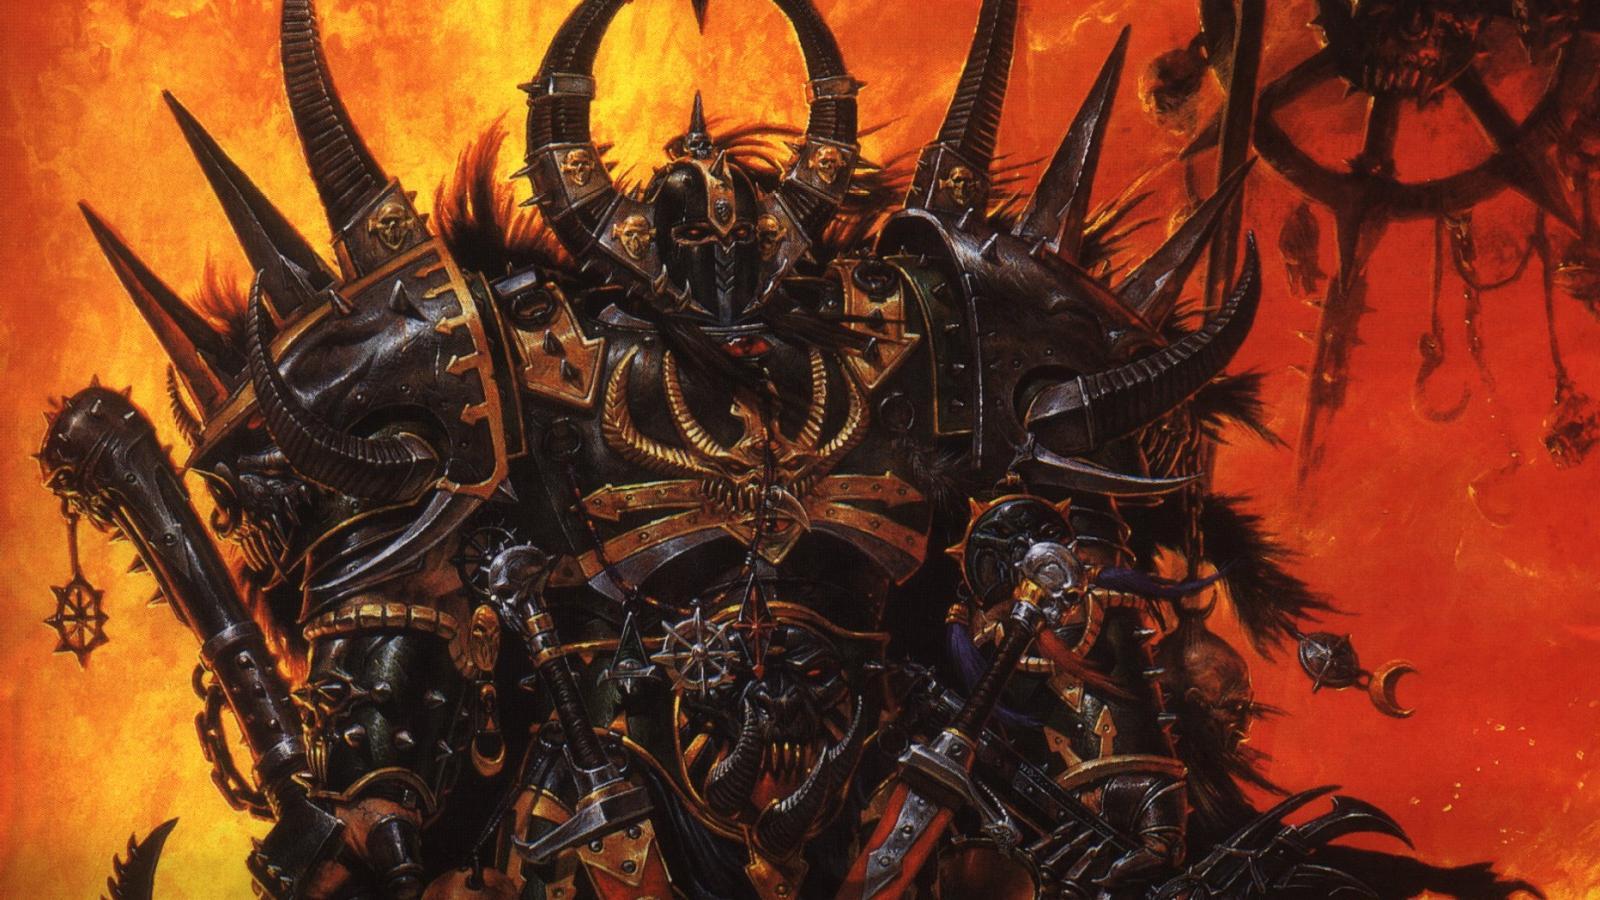 1920x1080 warhammer 40k chaos 1600x900